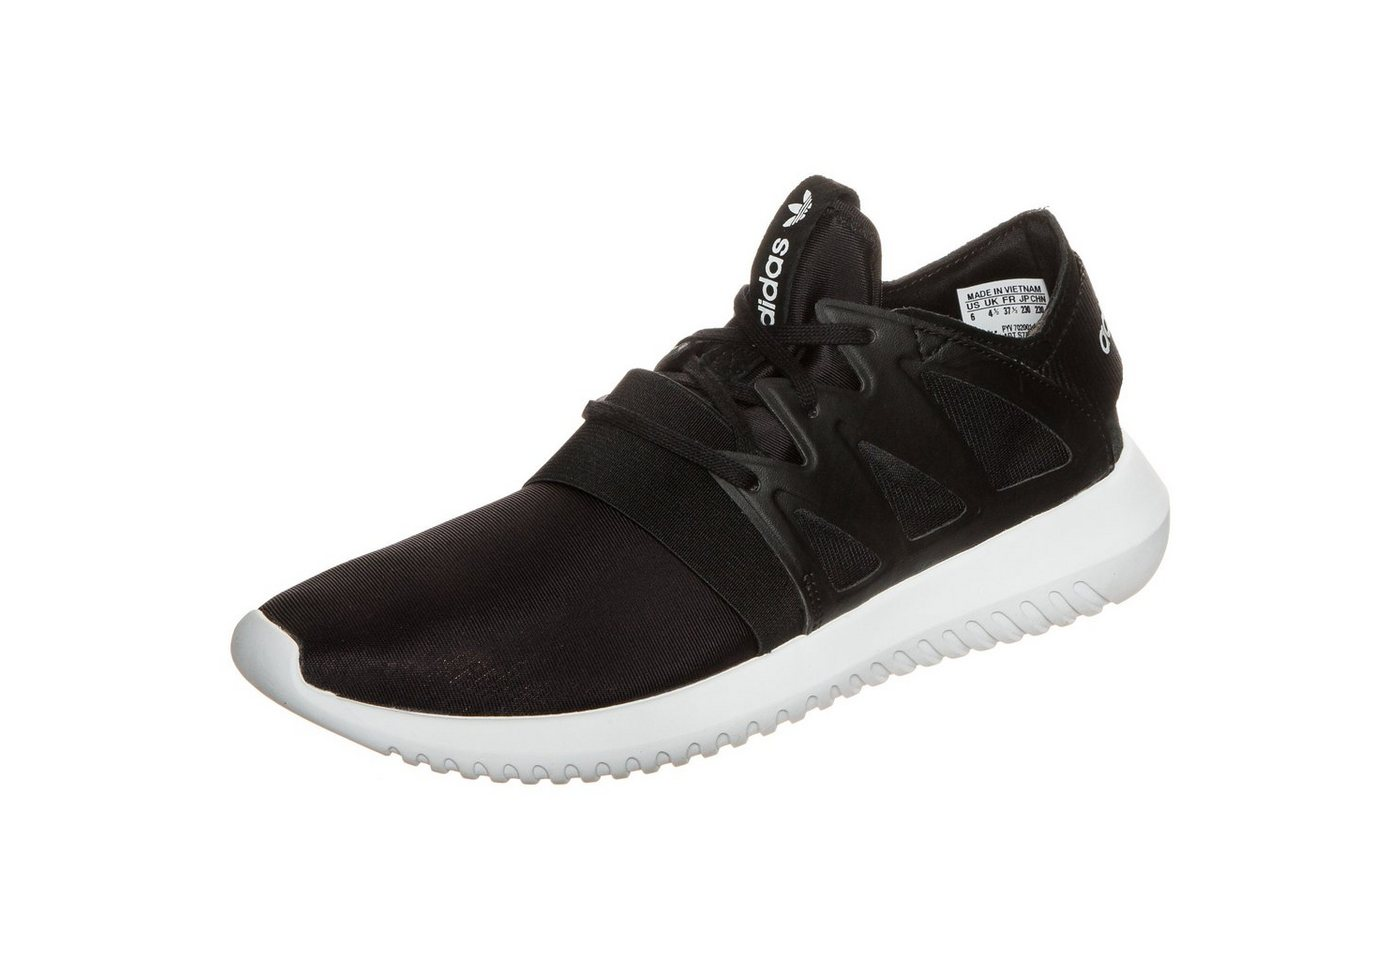 Sneaker Suchmaschine   Sneaker Blog   Sneaker Shop   Sneakerhall